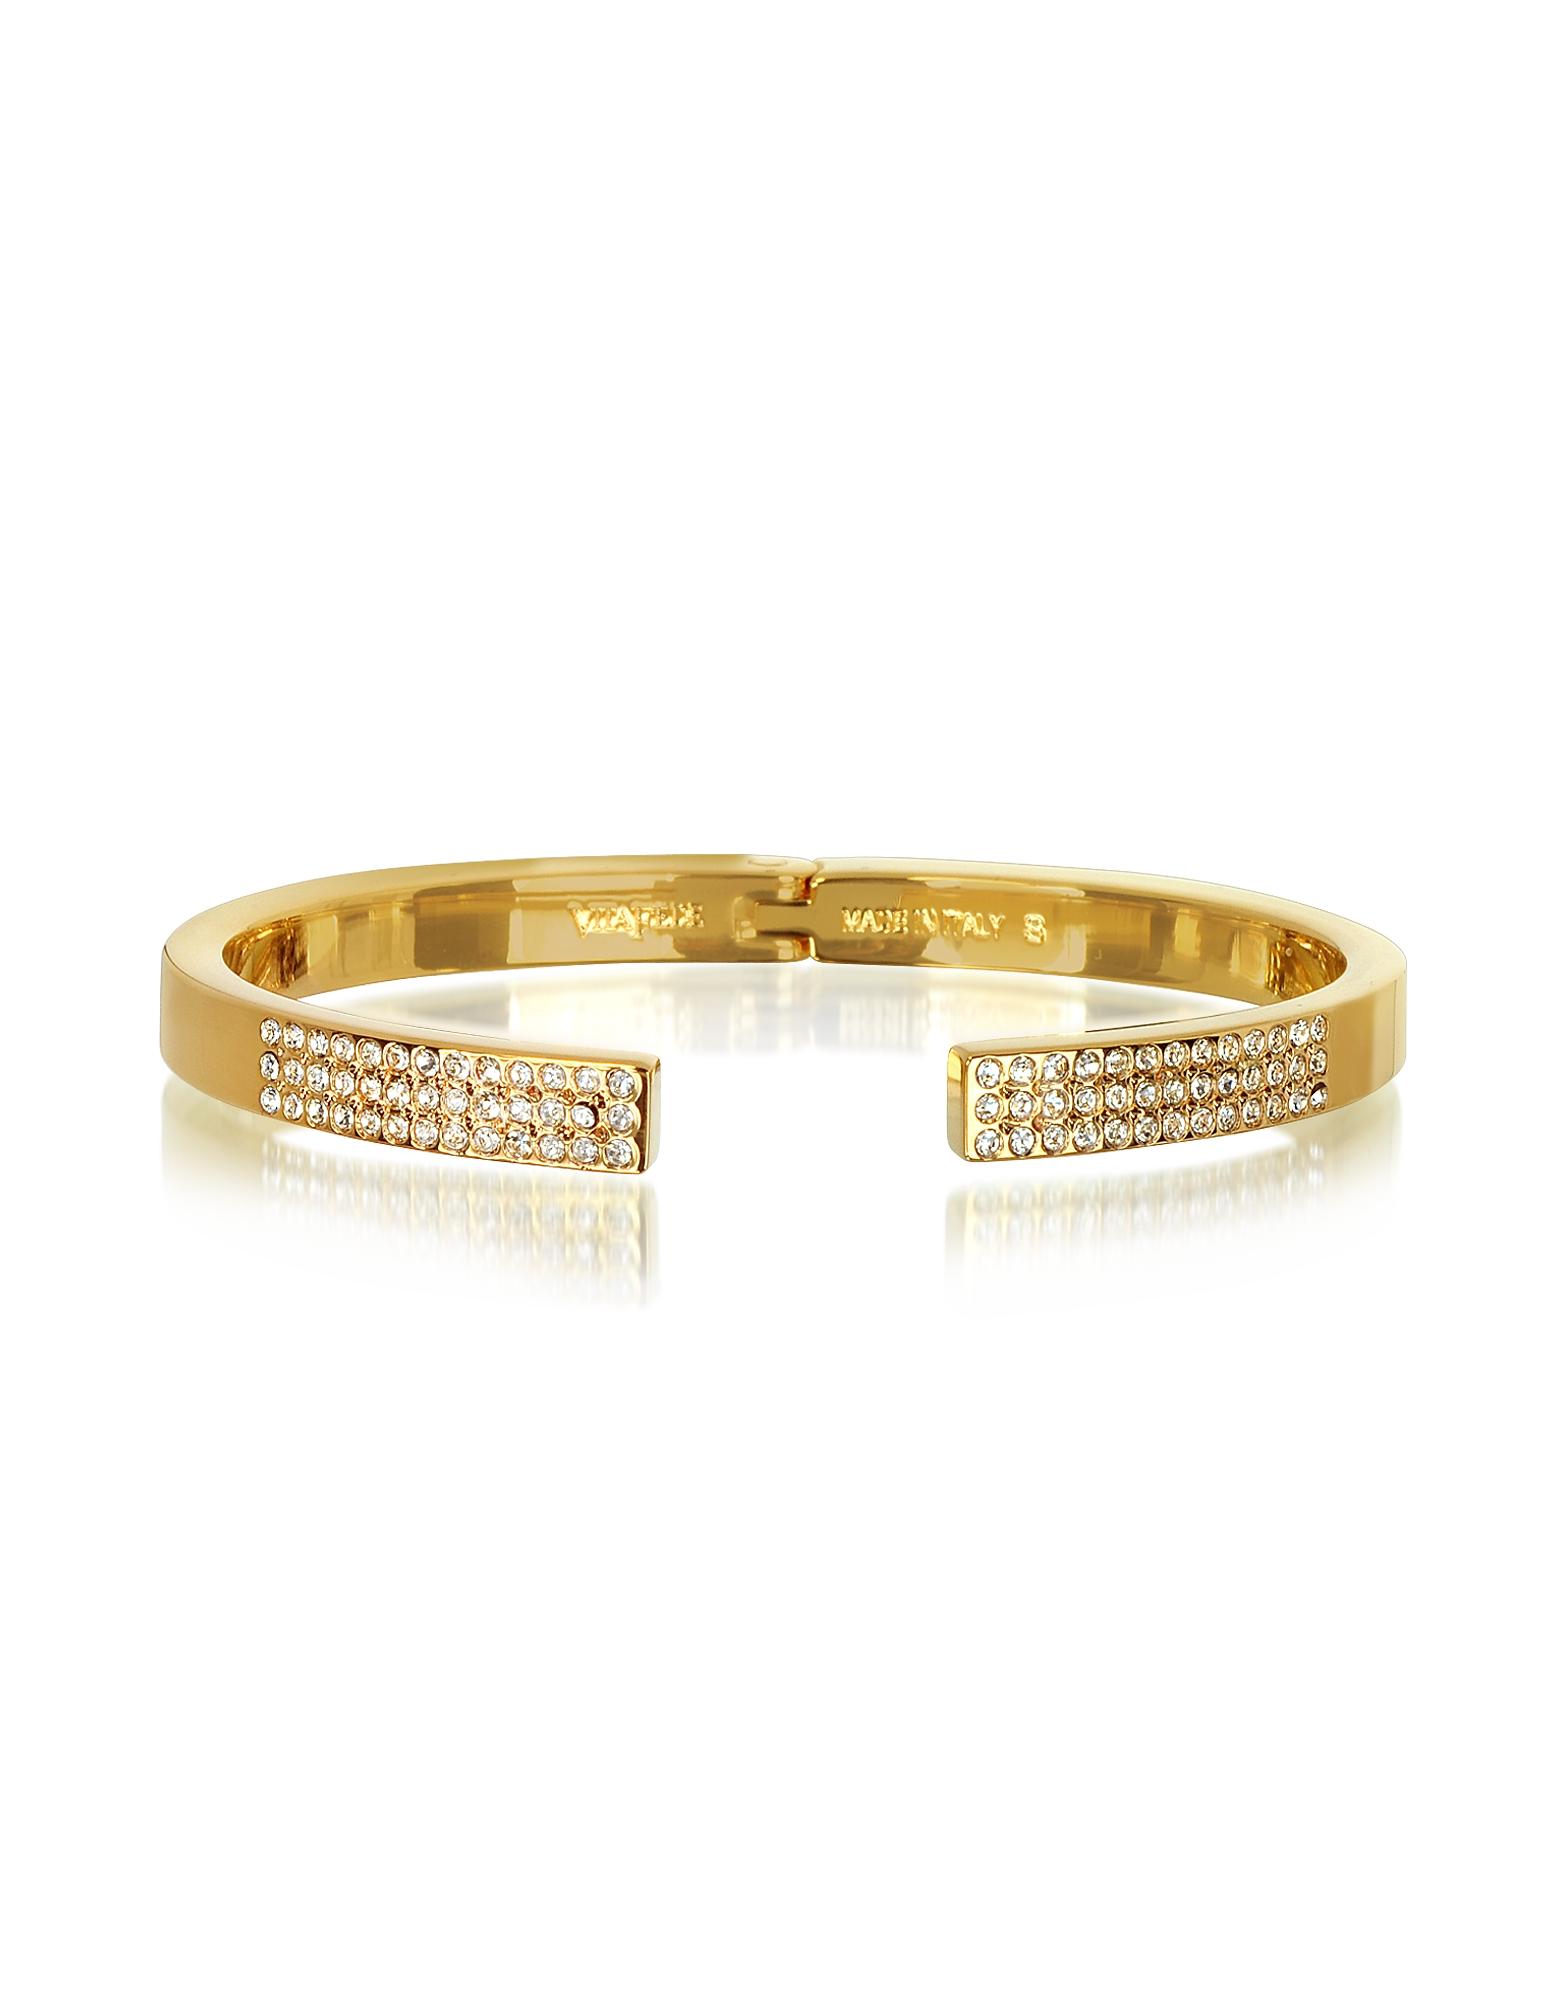 Vita Fede Diviso Gold Tone Crystal Bracelet